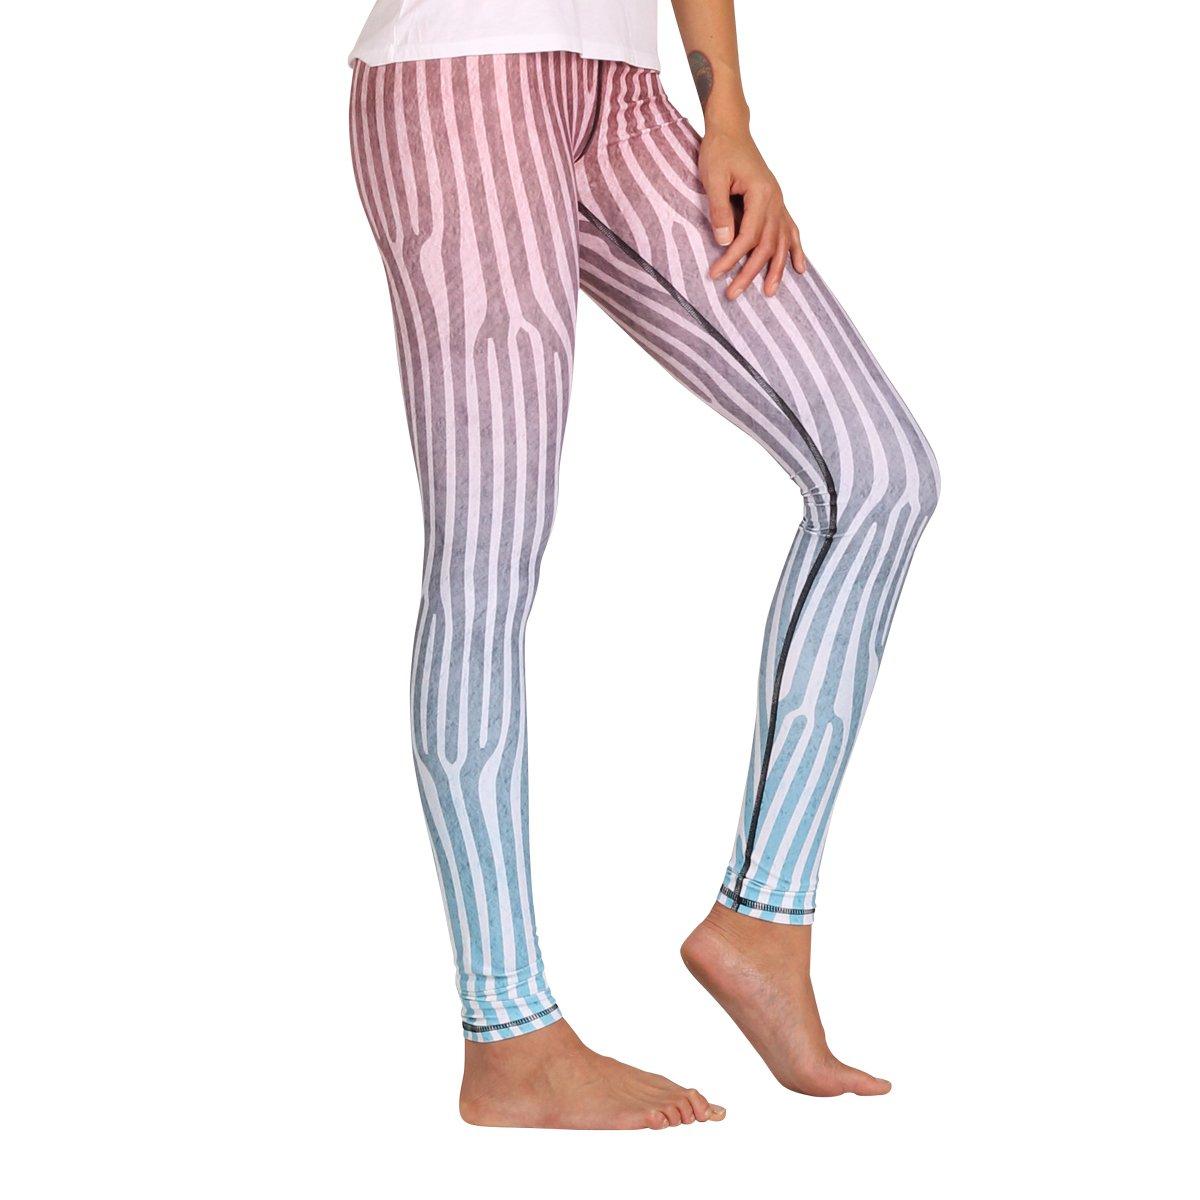 OMbré Printed Yoga Leggings